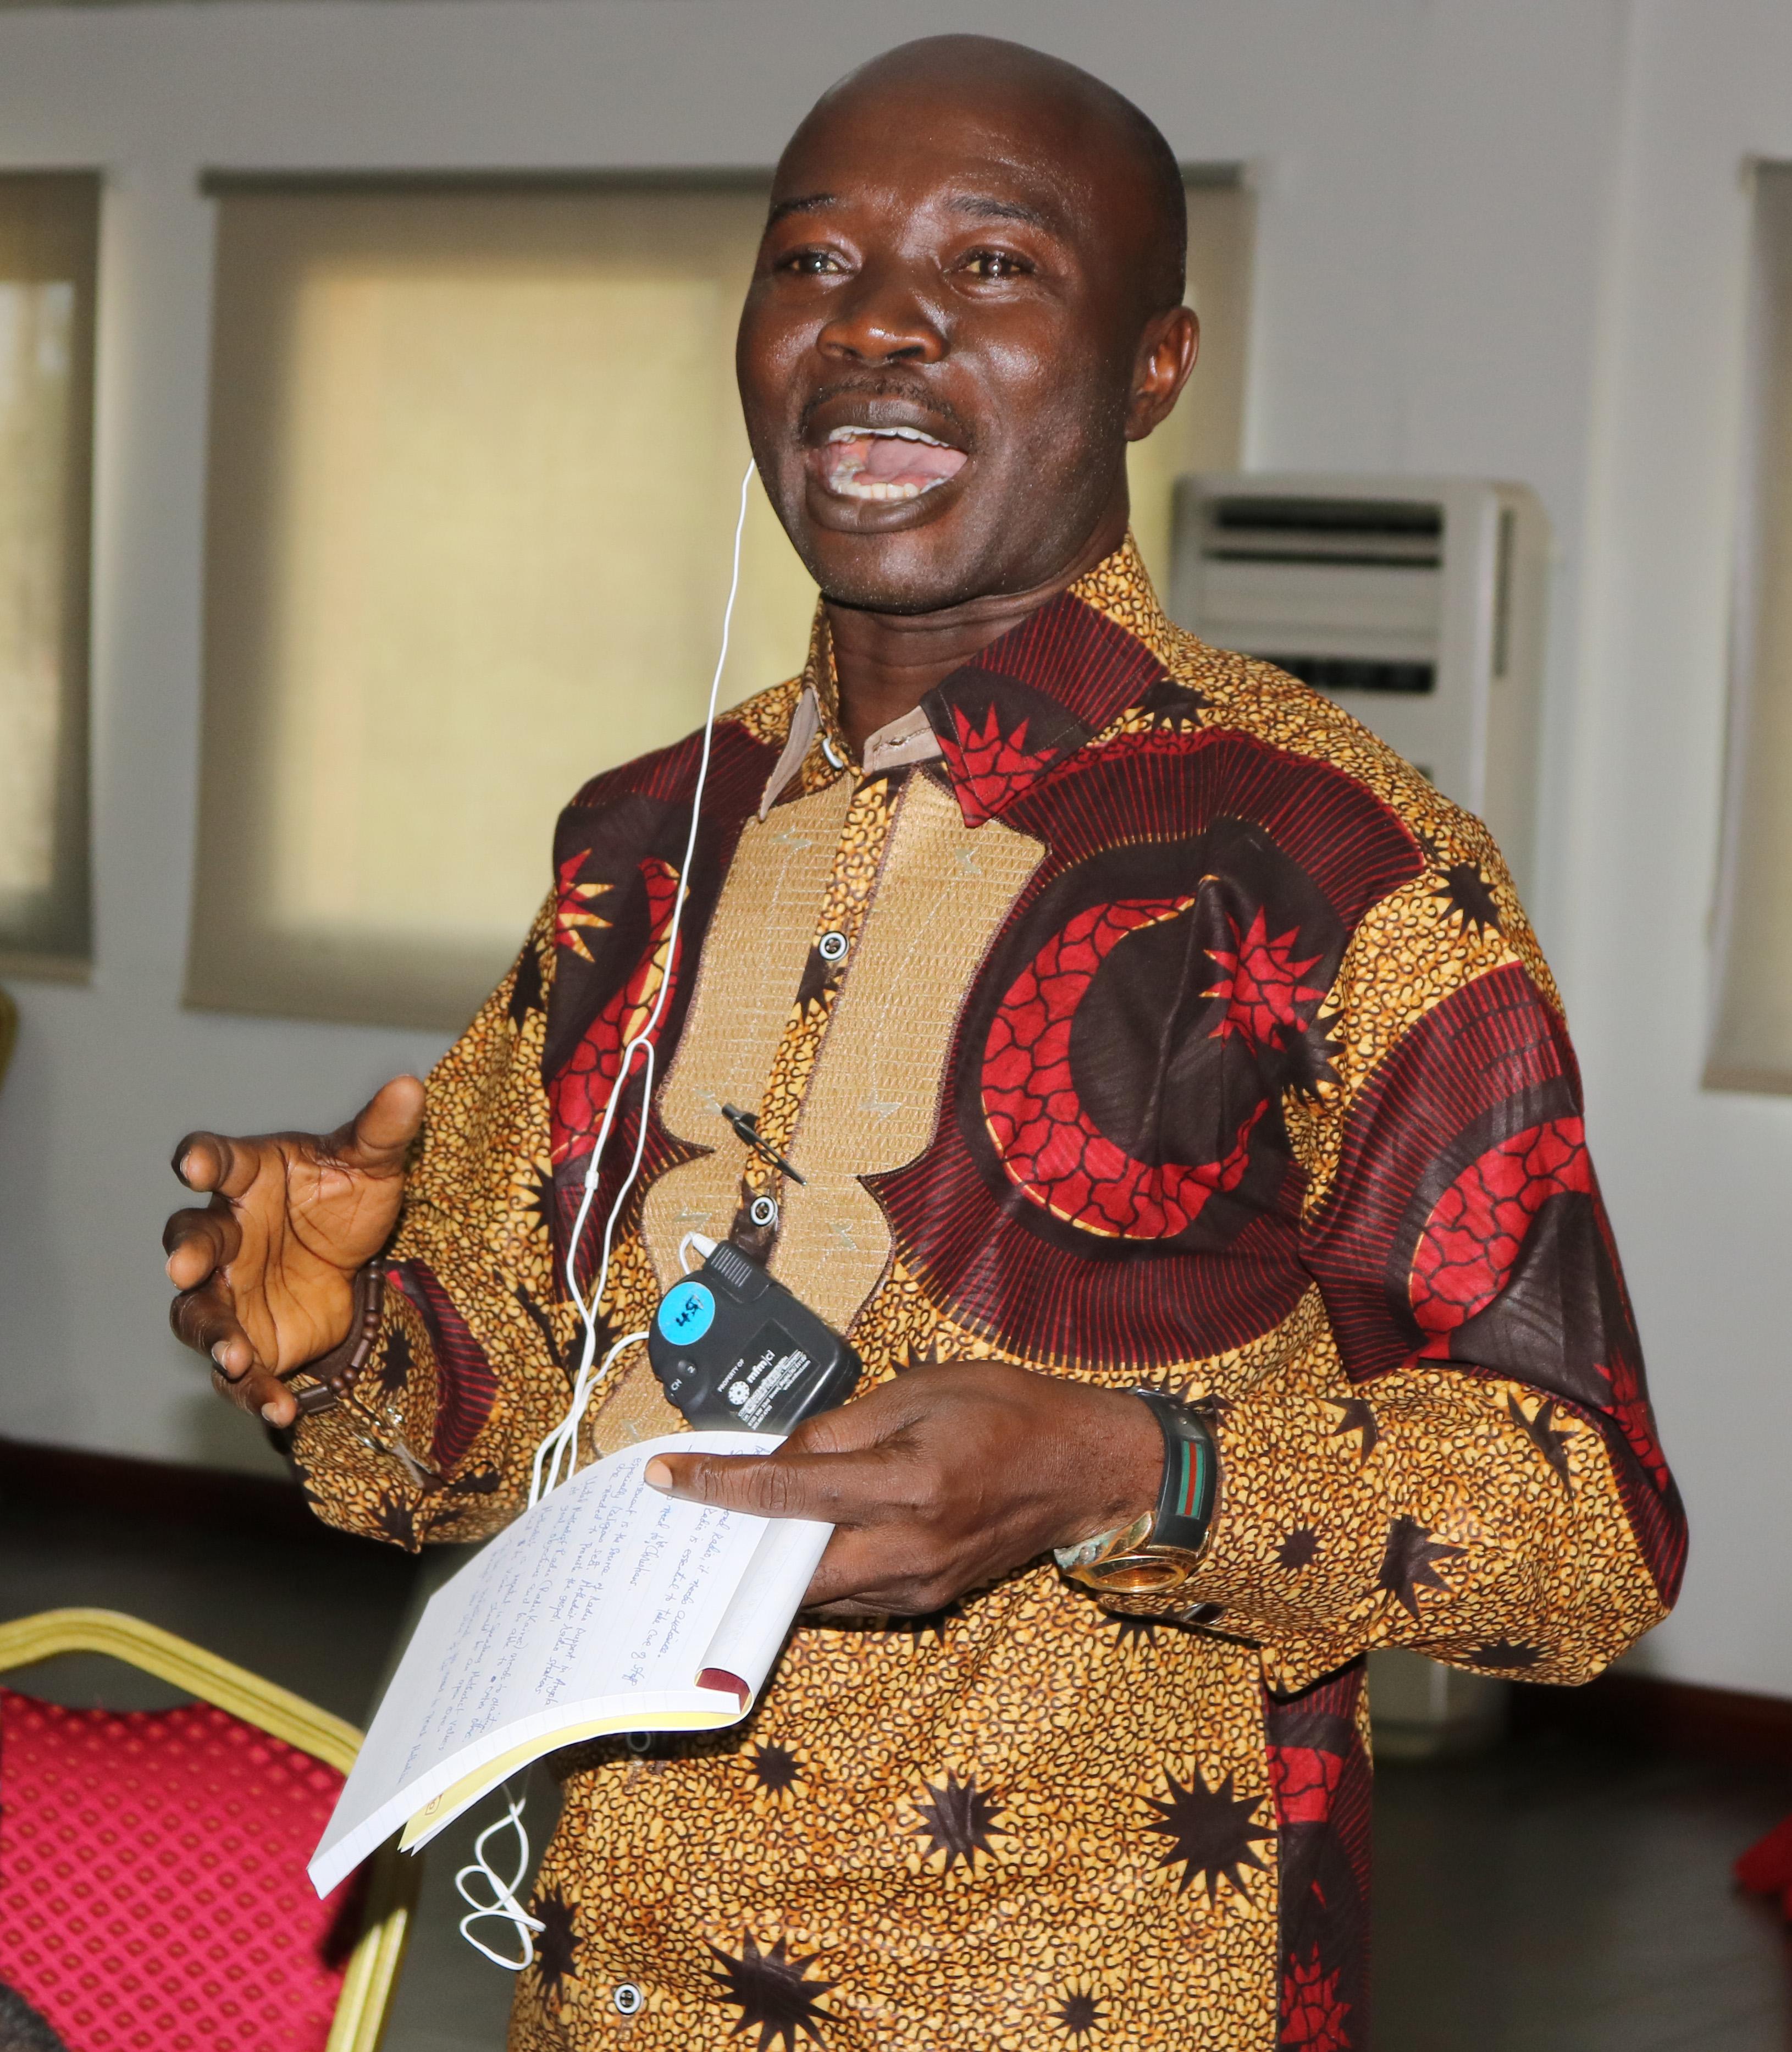 Edward Lahai Massaquoi speaks during the United Methodist Radio Network meeting in Luanda, Angola, April 24-26, 2018. Photo by Taurai Emmanuel Maforo, UMNS.